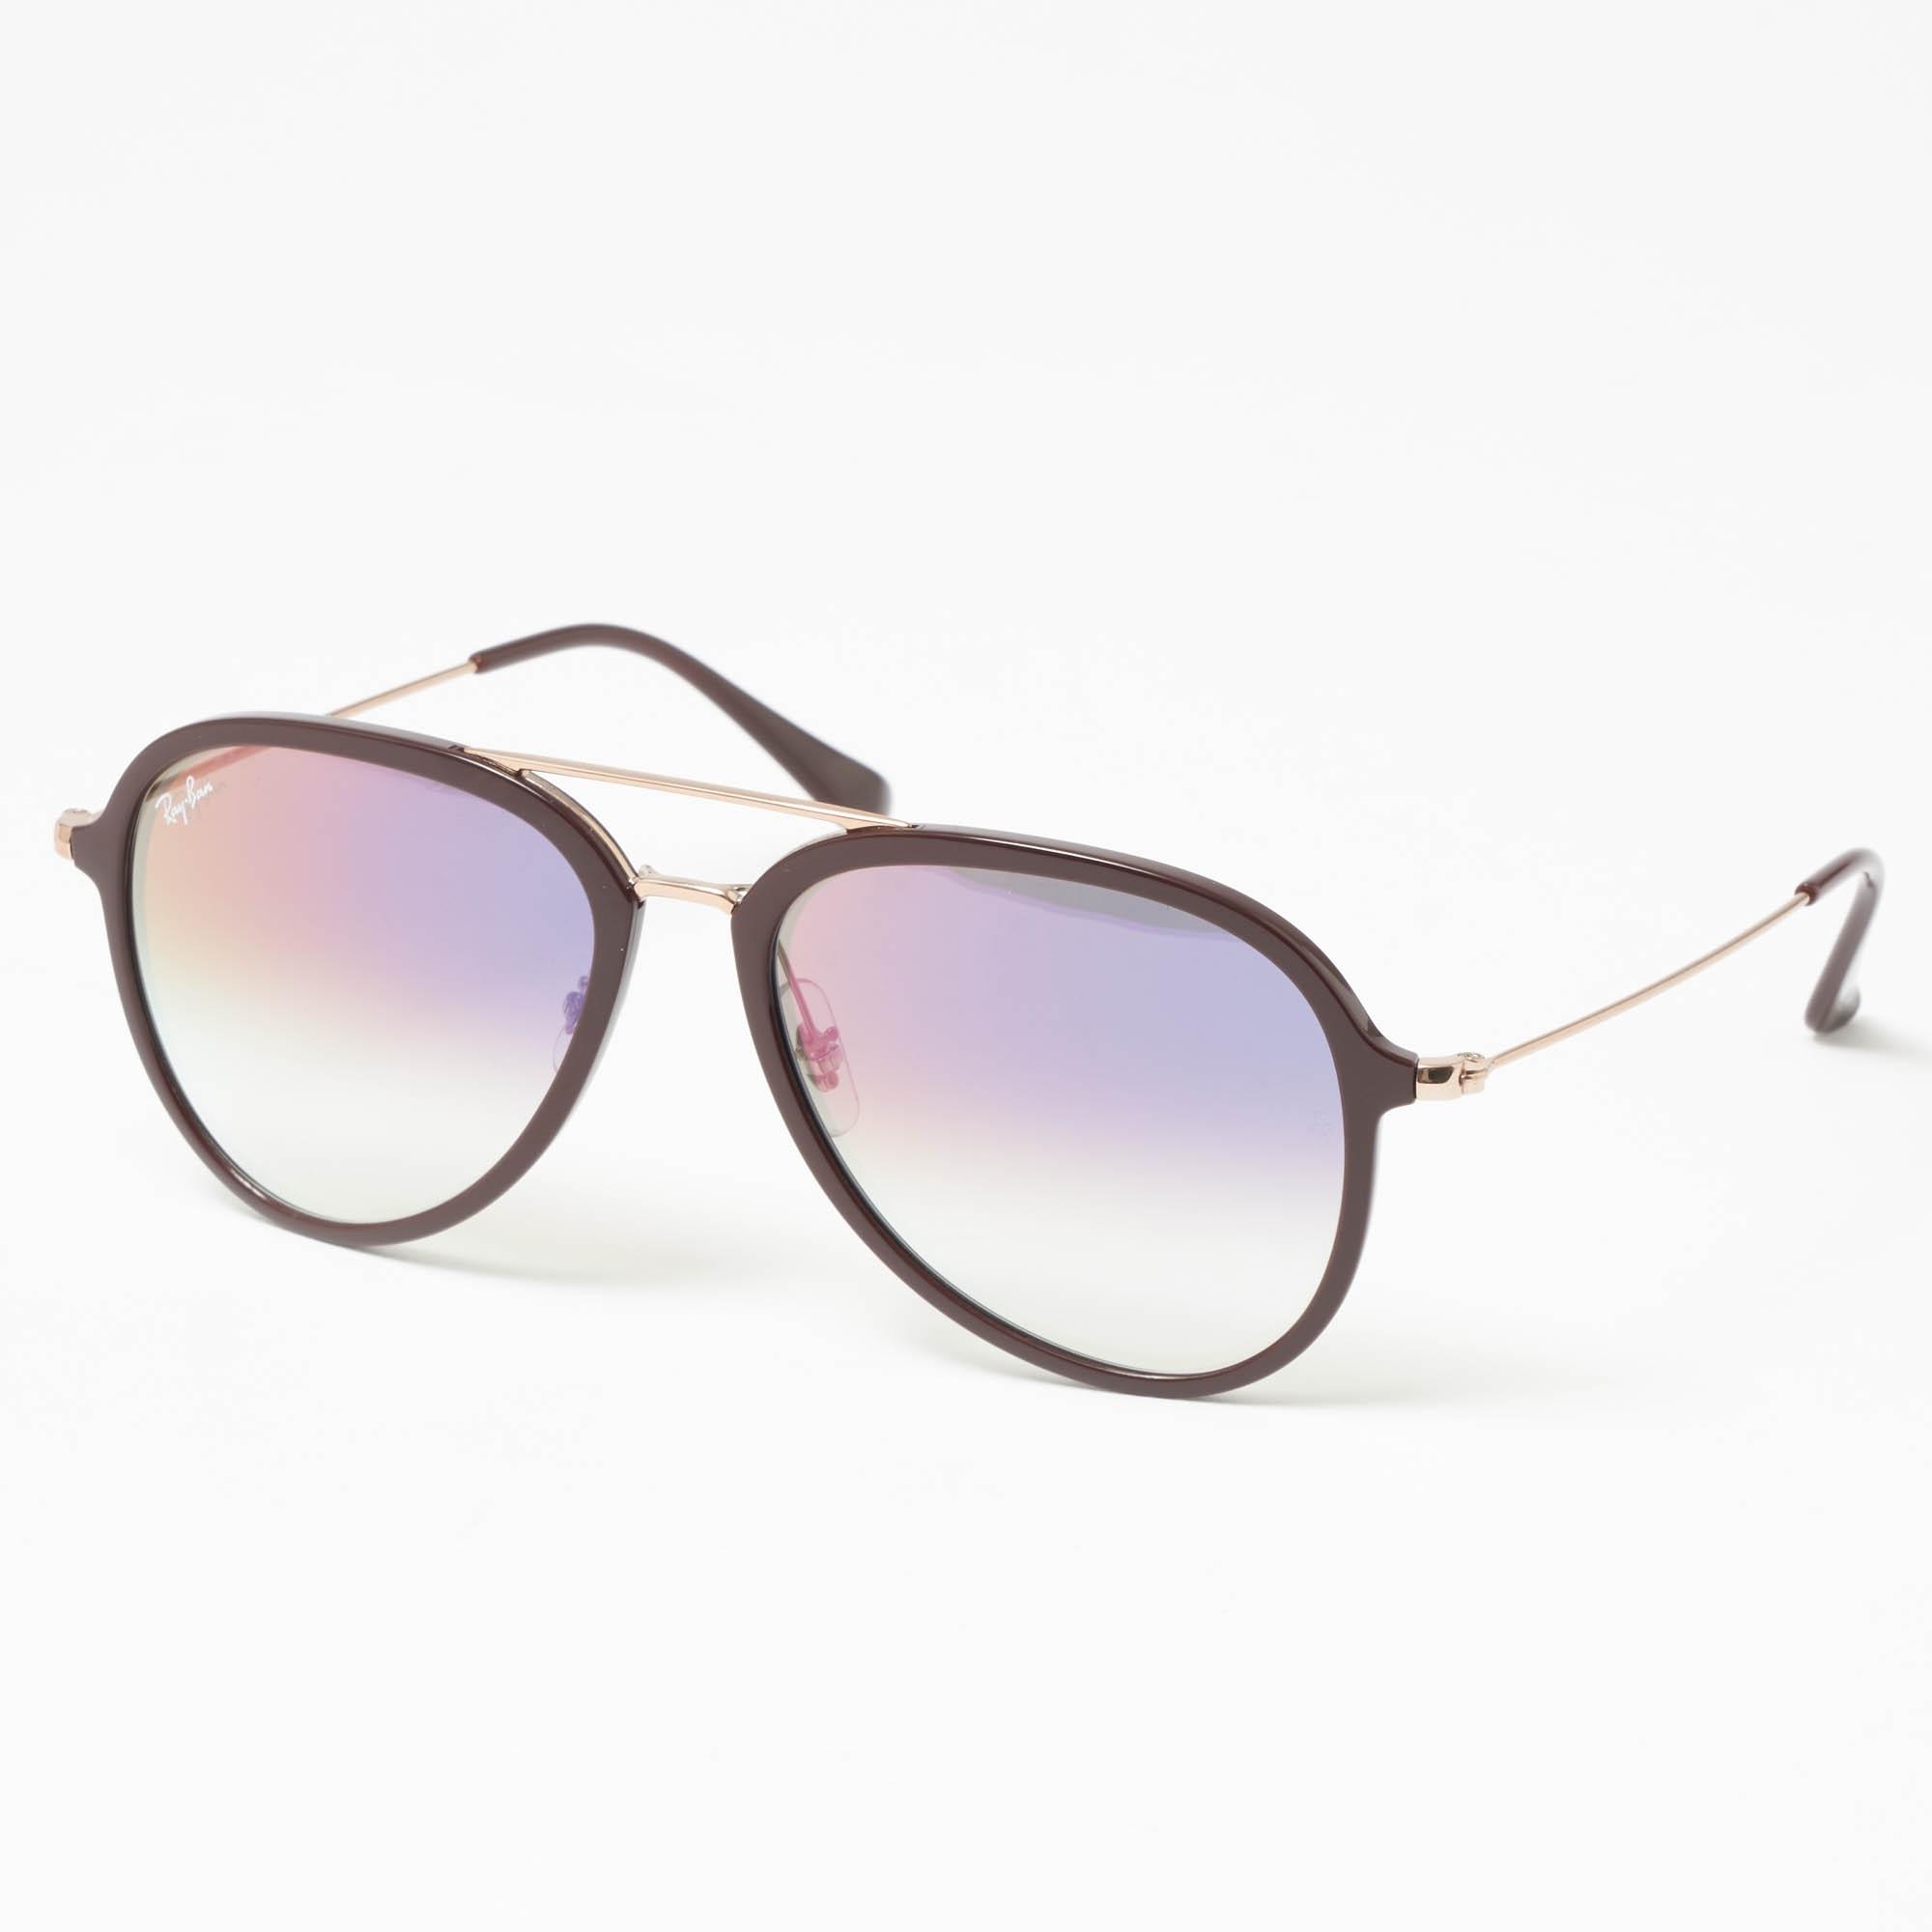 d74c79bb453 Ray Ban Plum RB4298 Sunglasses Gradient Lenses